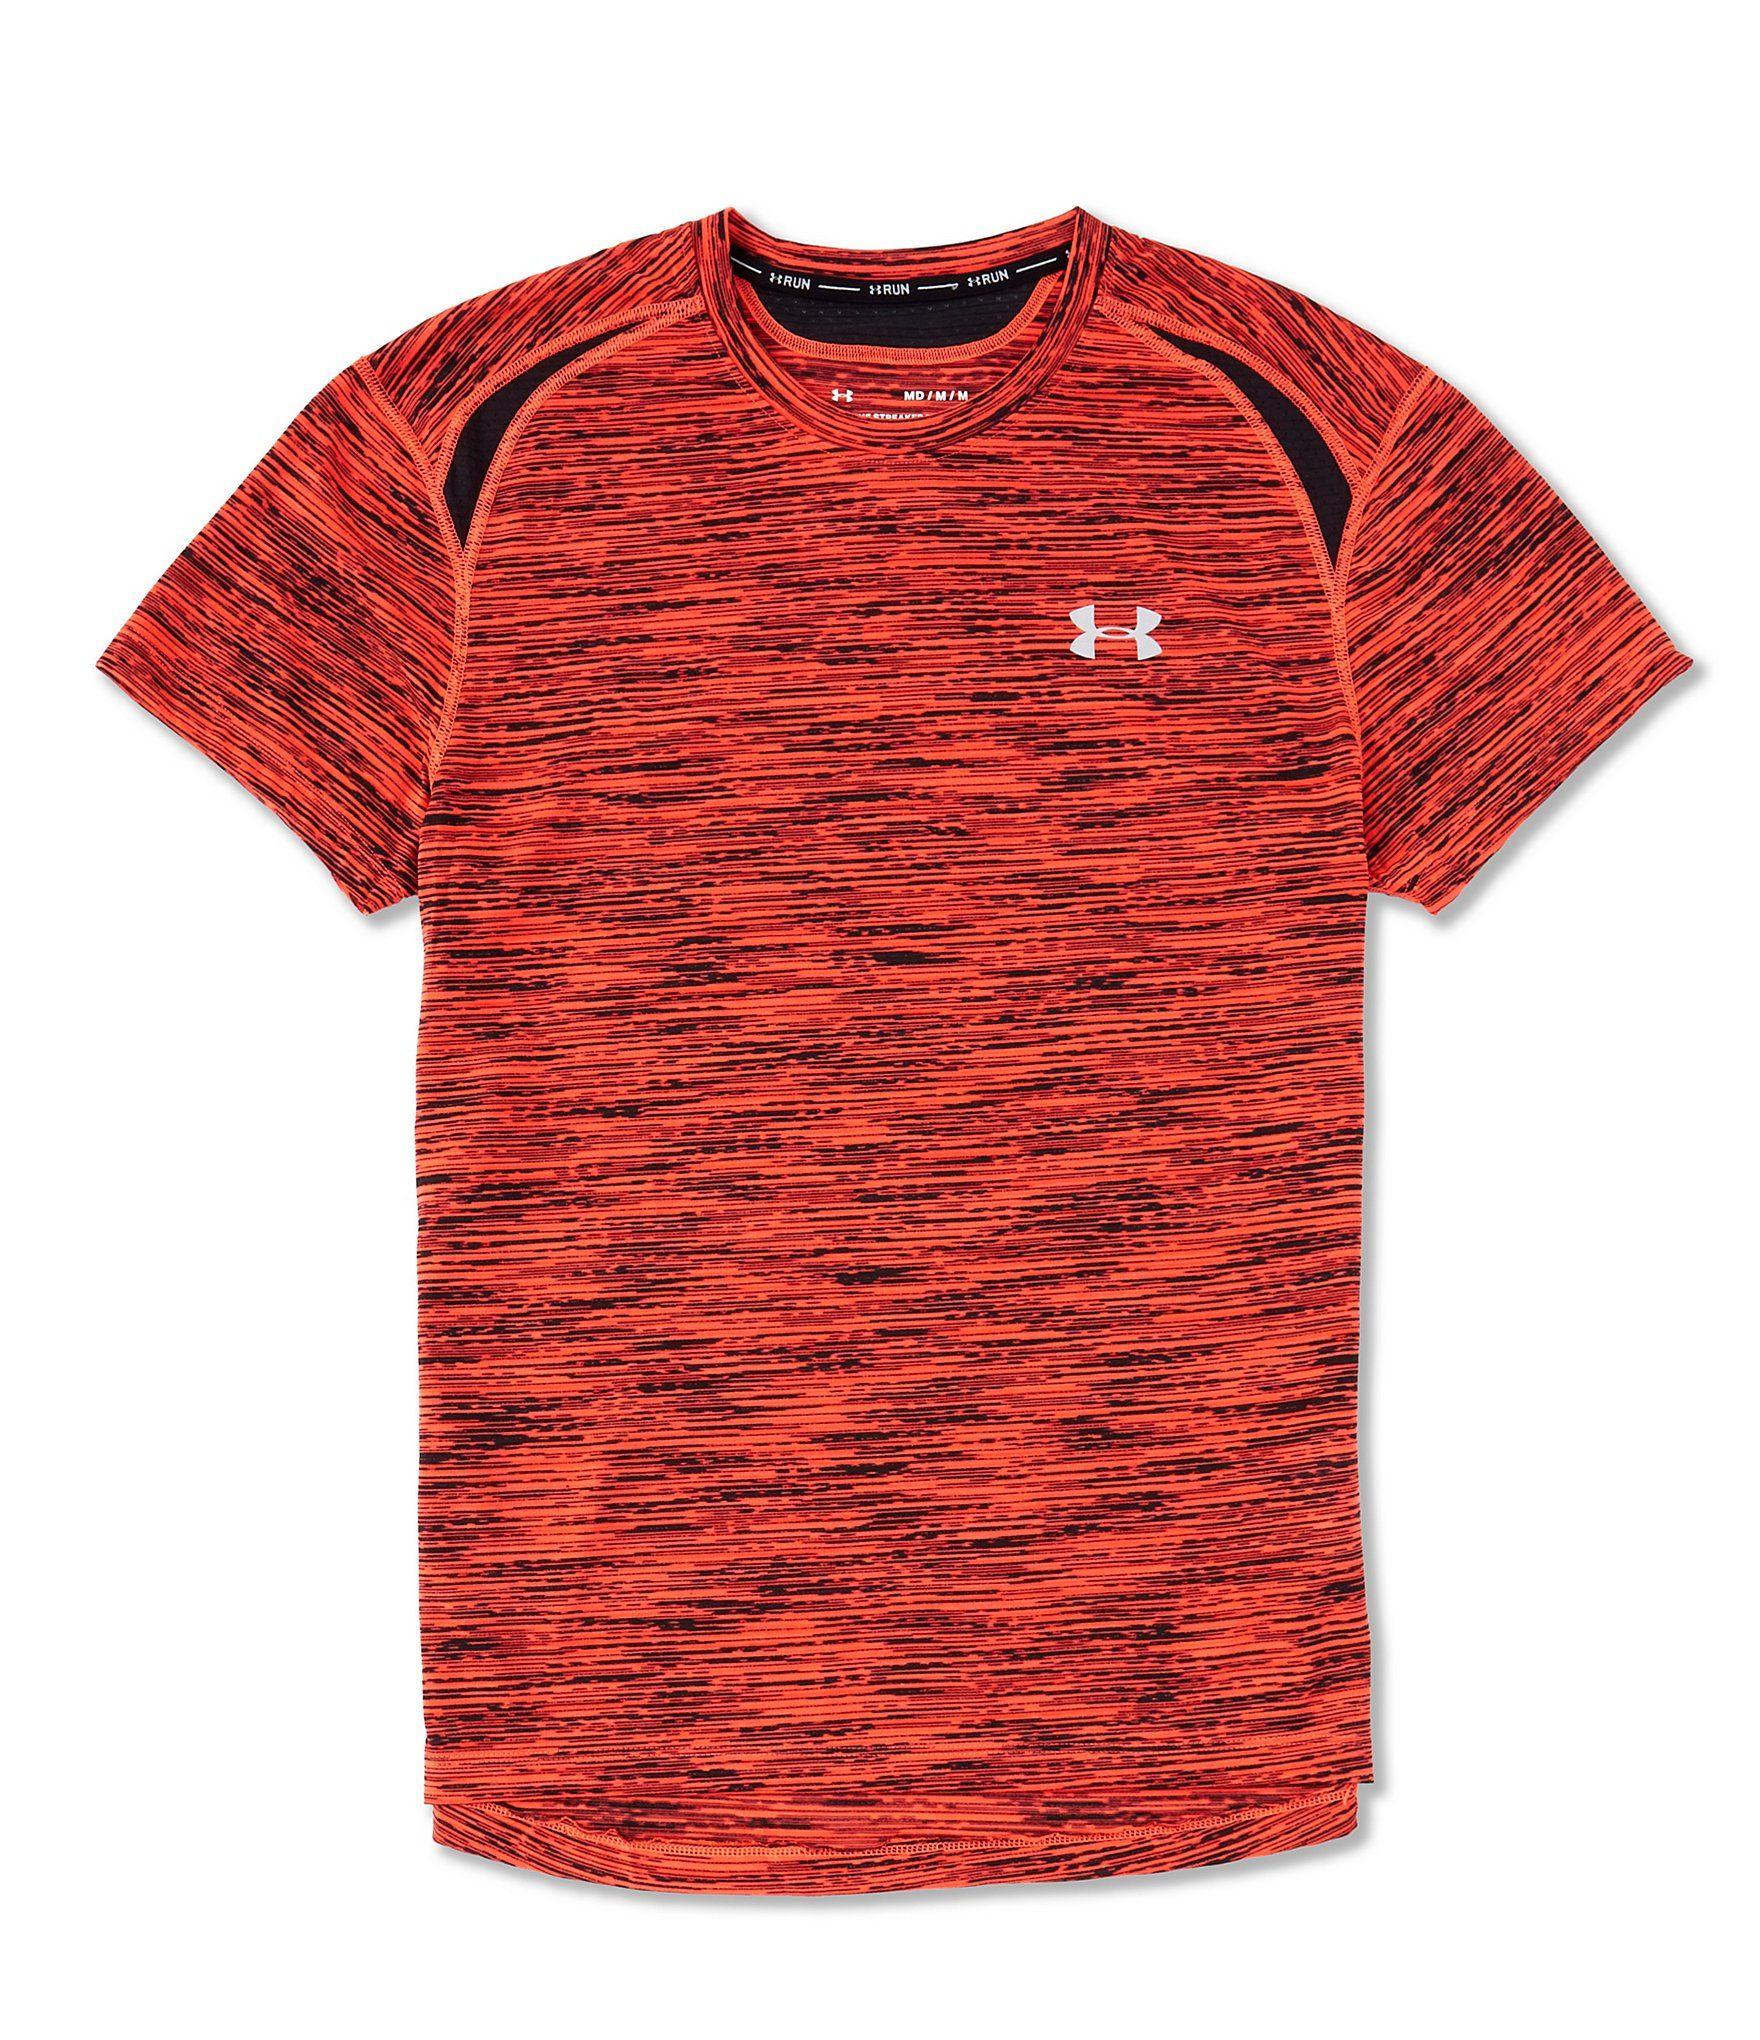 Under Armour Mens Streaker 2.0 Time Lapse Short-Sleeve T-Shirt